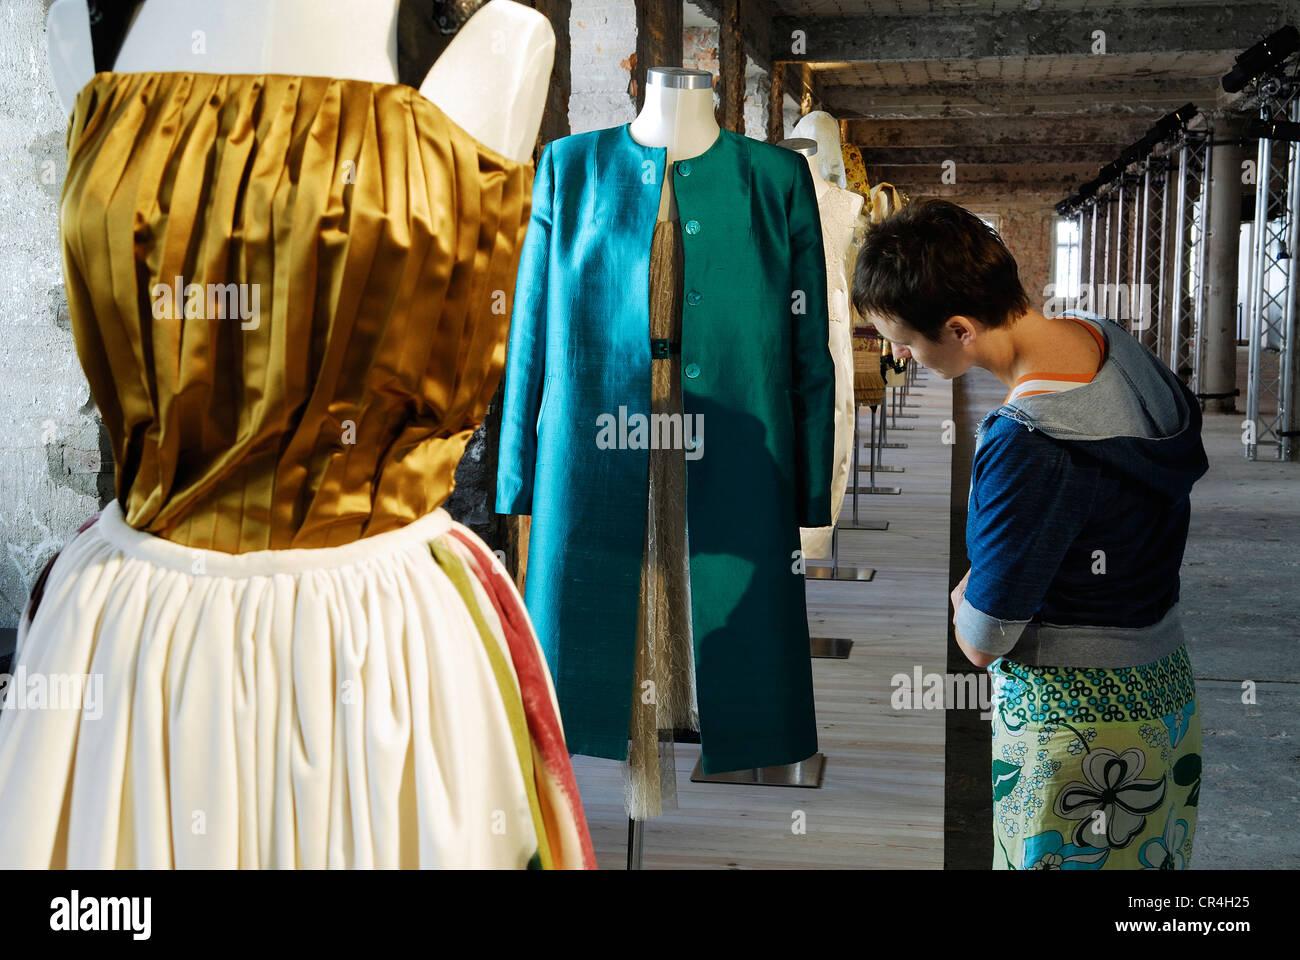 Portugal Lisbon Mude Design Fashion Museum Rua Augusta 24 Exhibition Stock Photo Alamy